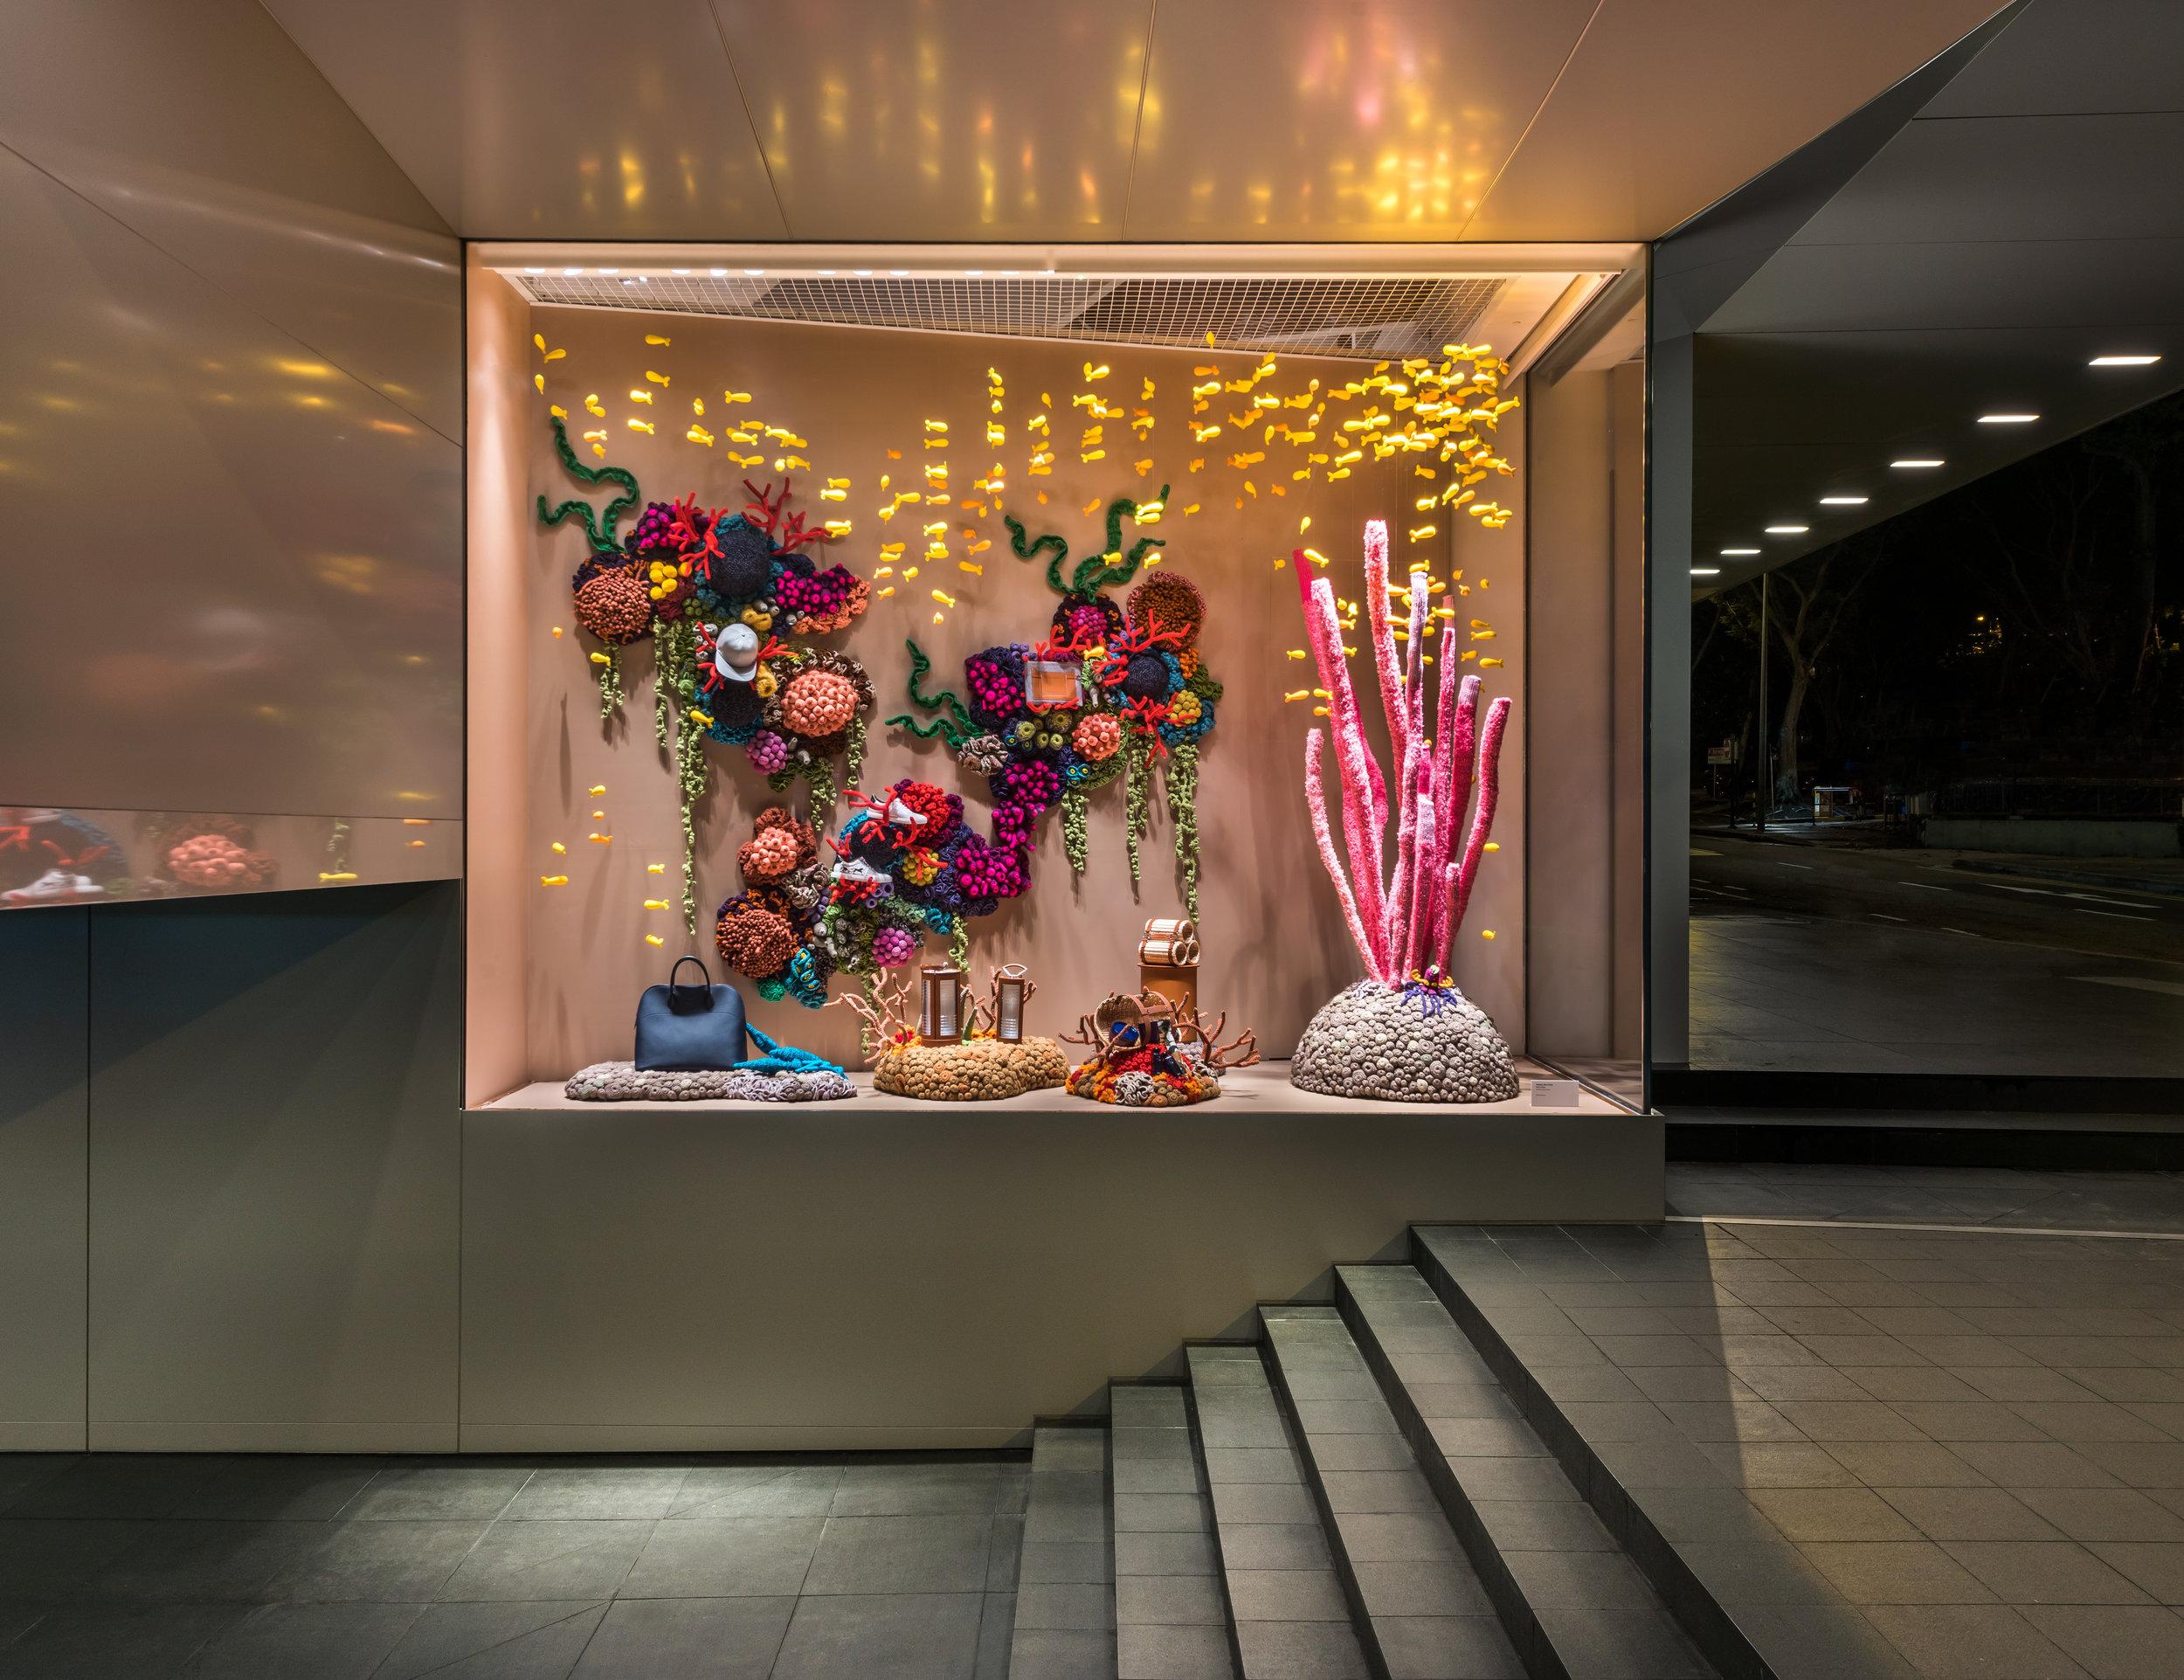 'Irama' by Mulyana for Hermès Liat Towers. Image by Edward Hendricks.